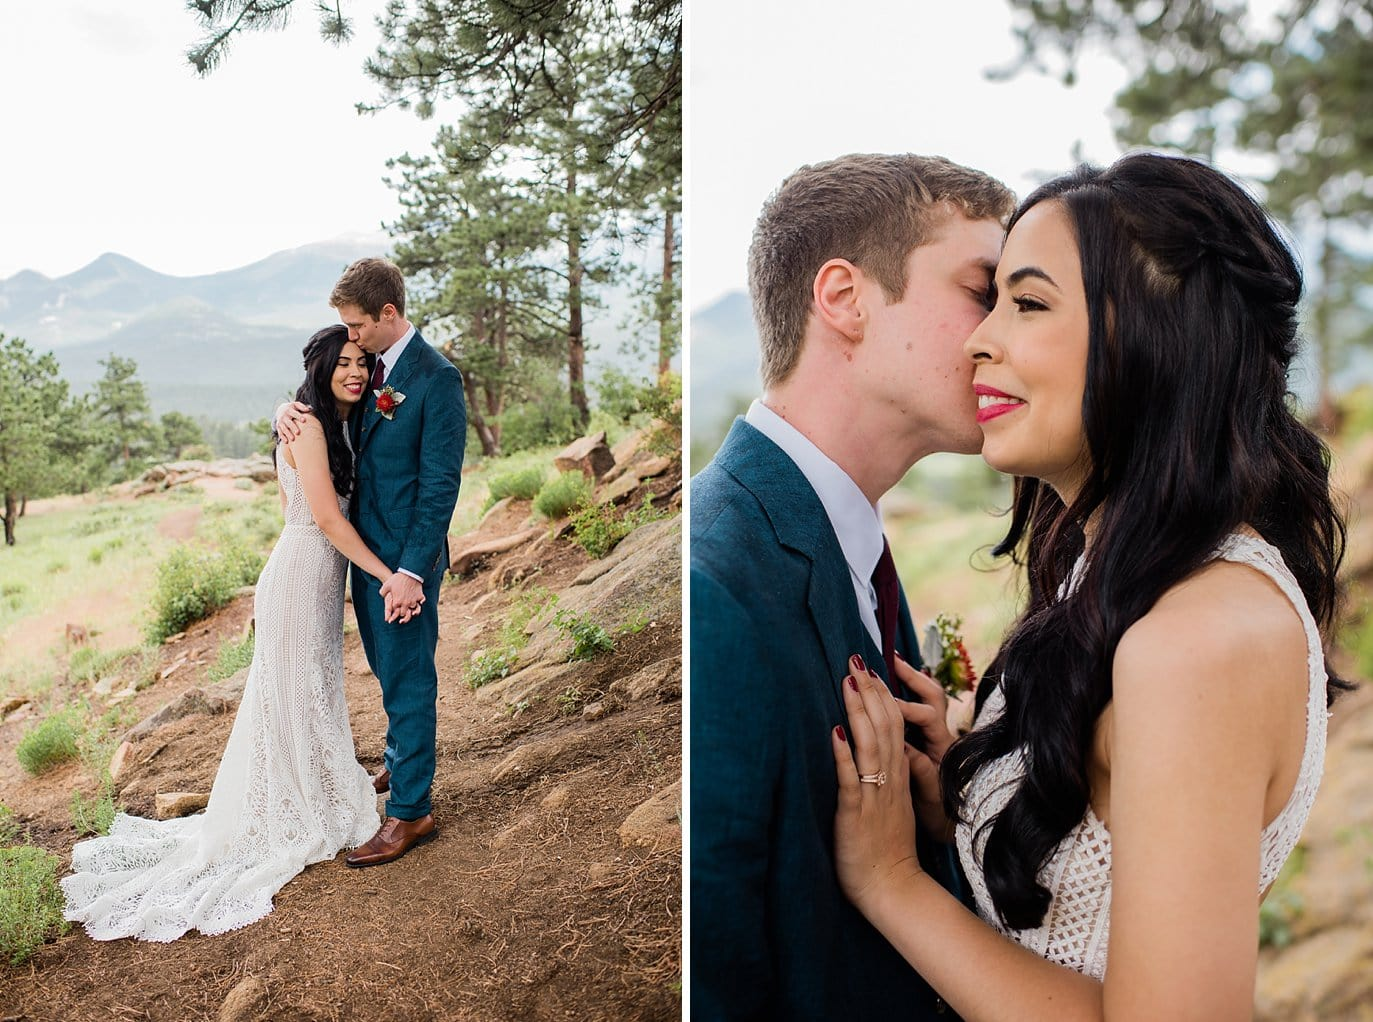 intimate Colorado outdoor couple at Rocky Mountain Estes Park wedding by Estes Park Wedding Photography Jennie Crate